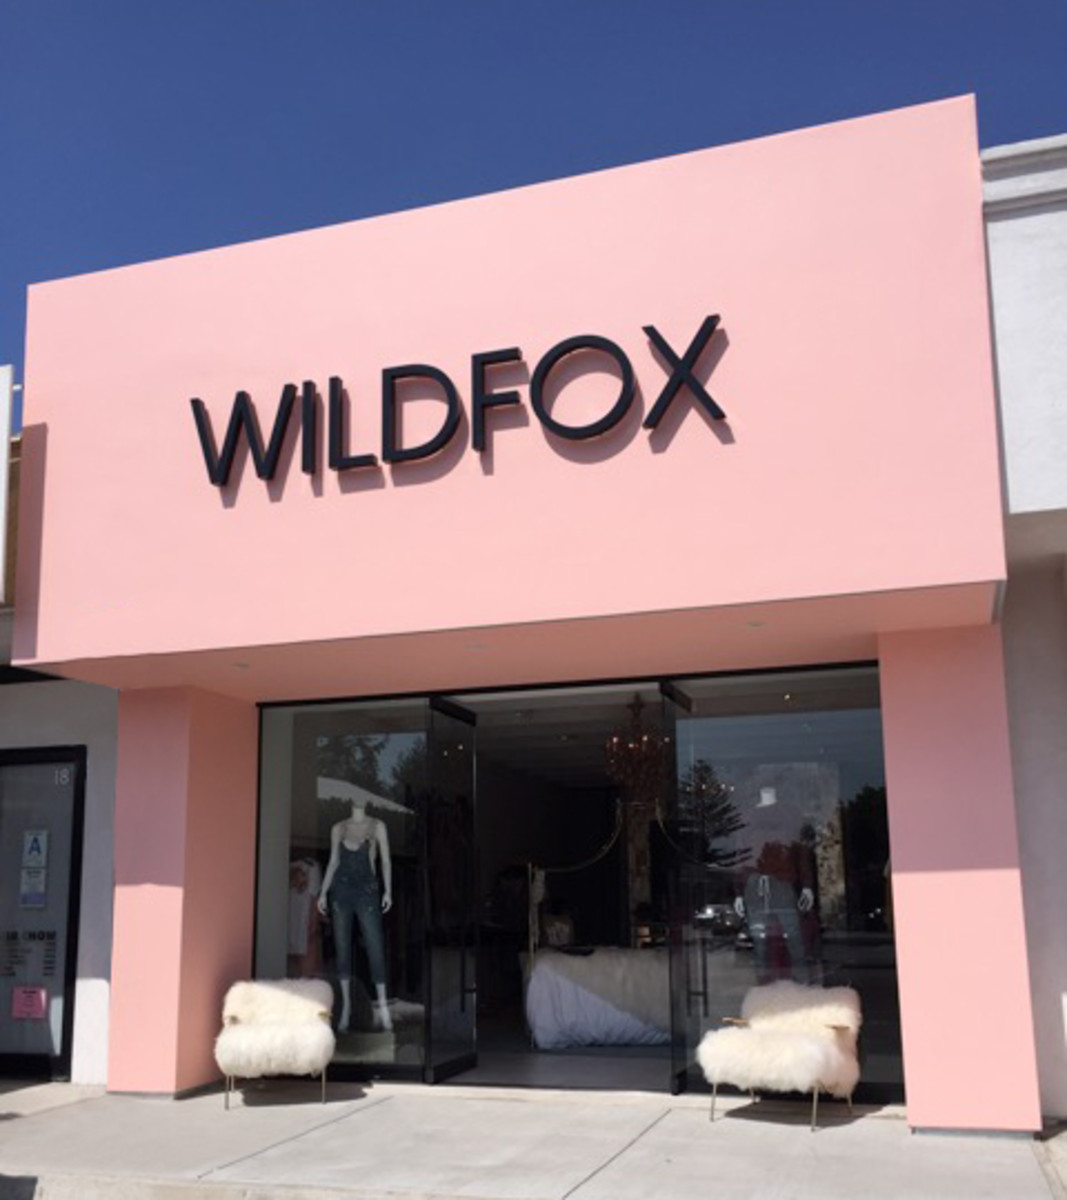 wildfox-malibu-store-nrjpg.jpg